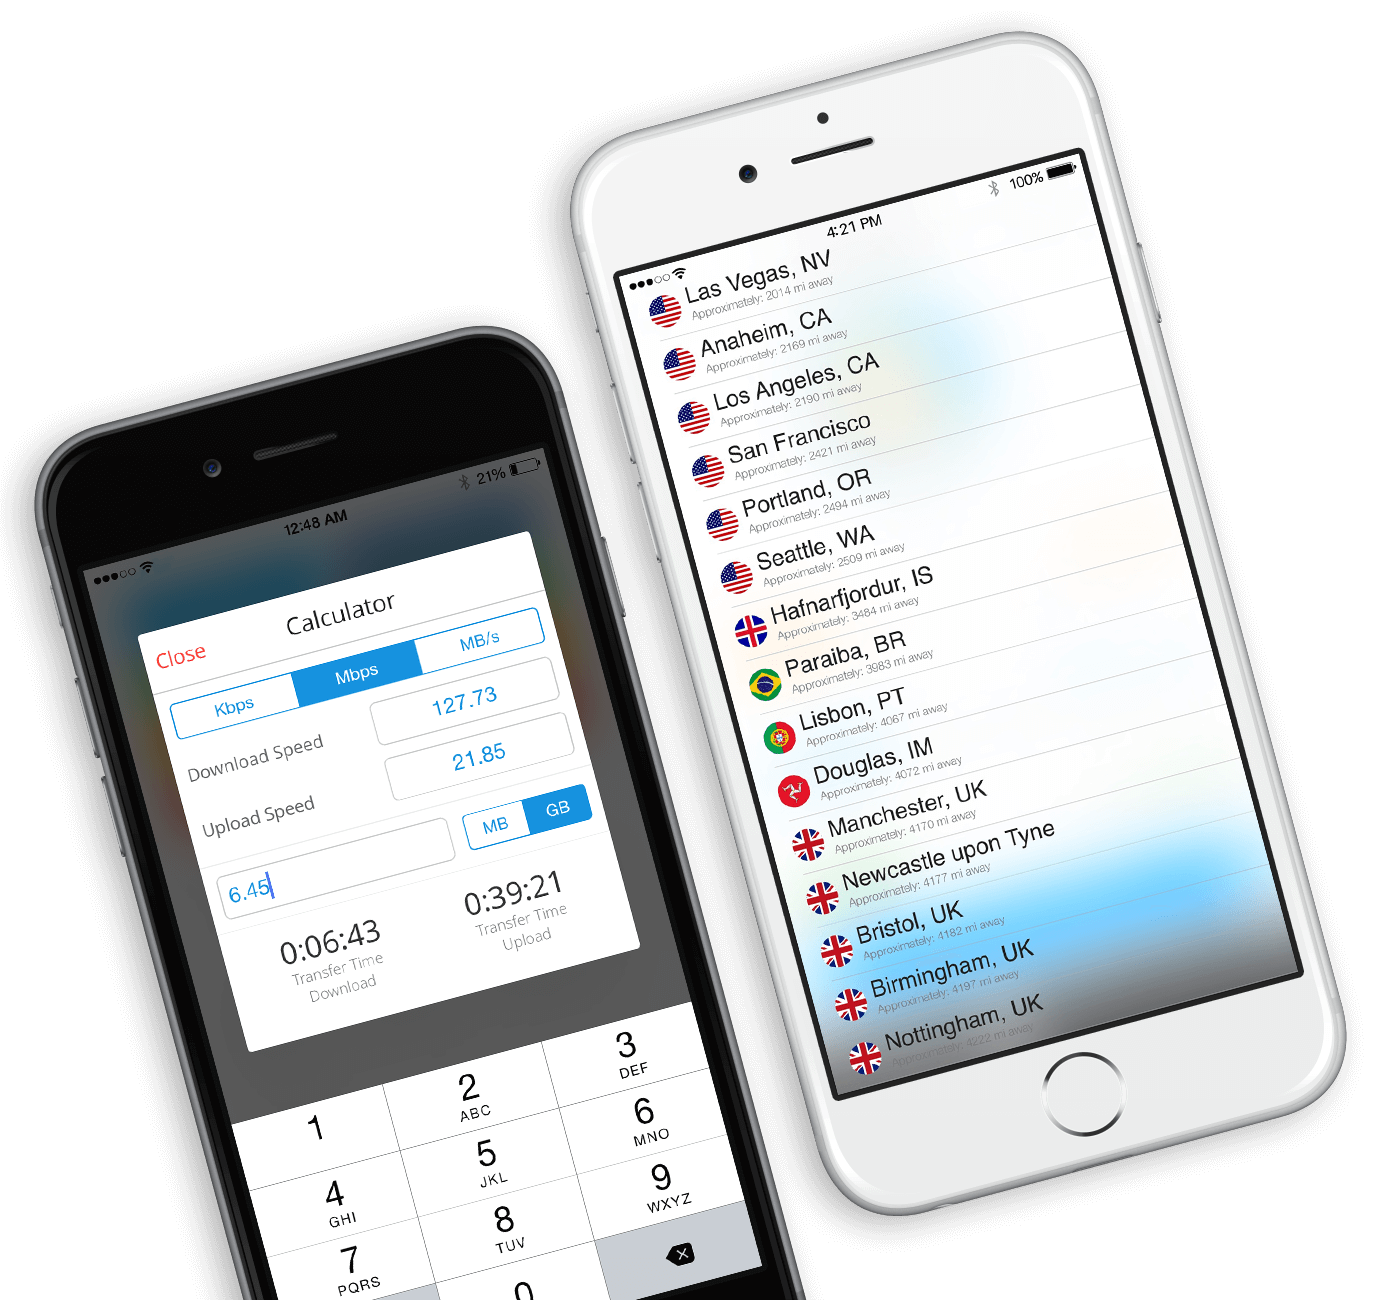 SpeedSmart - Speed Test Apps - Test Your Internet Speed Anywhere